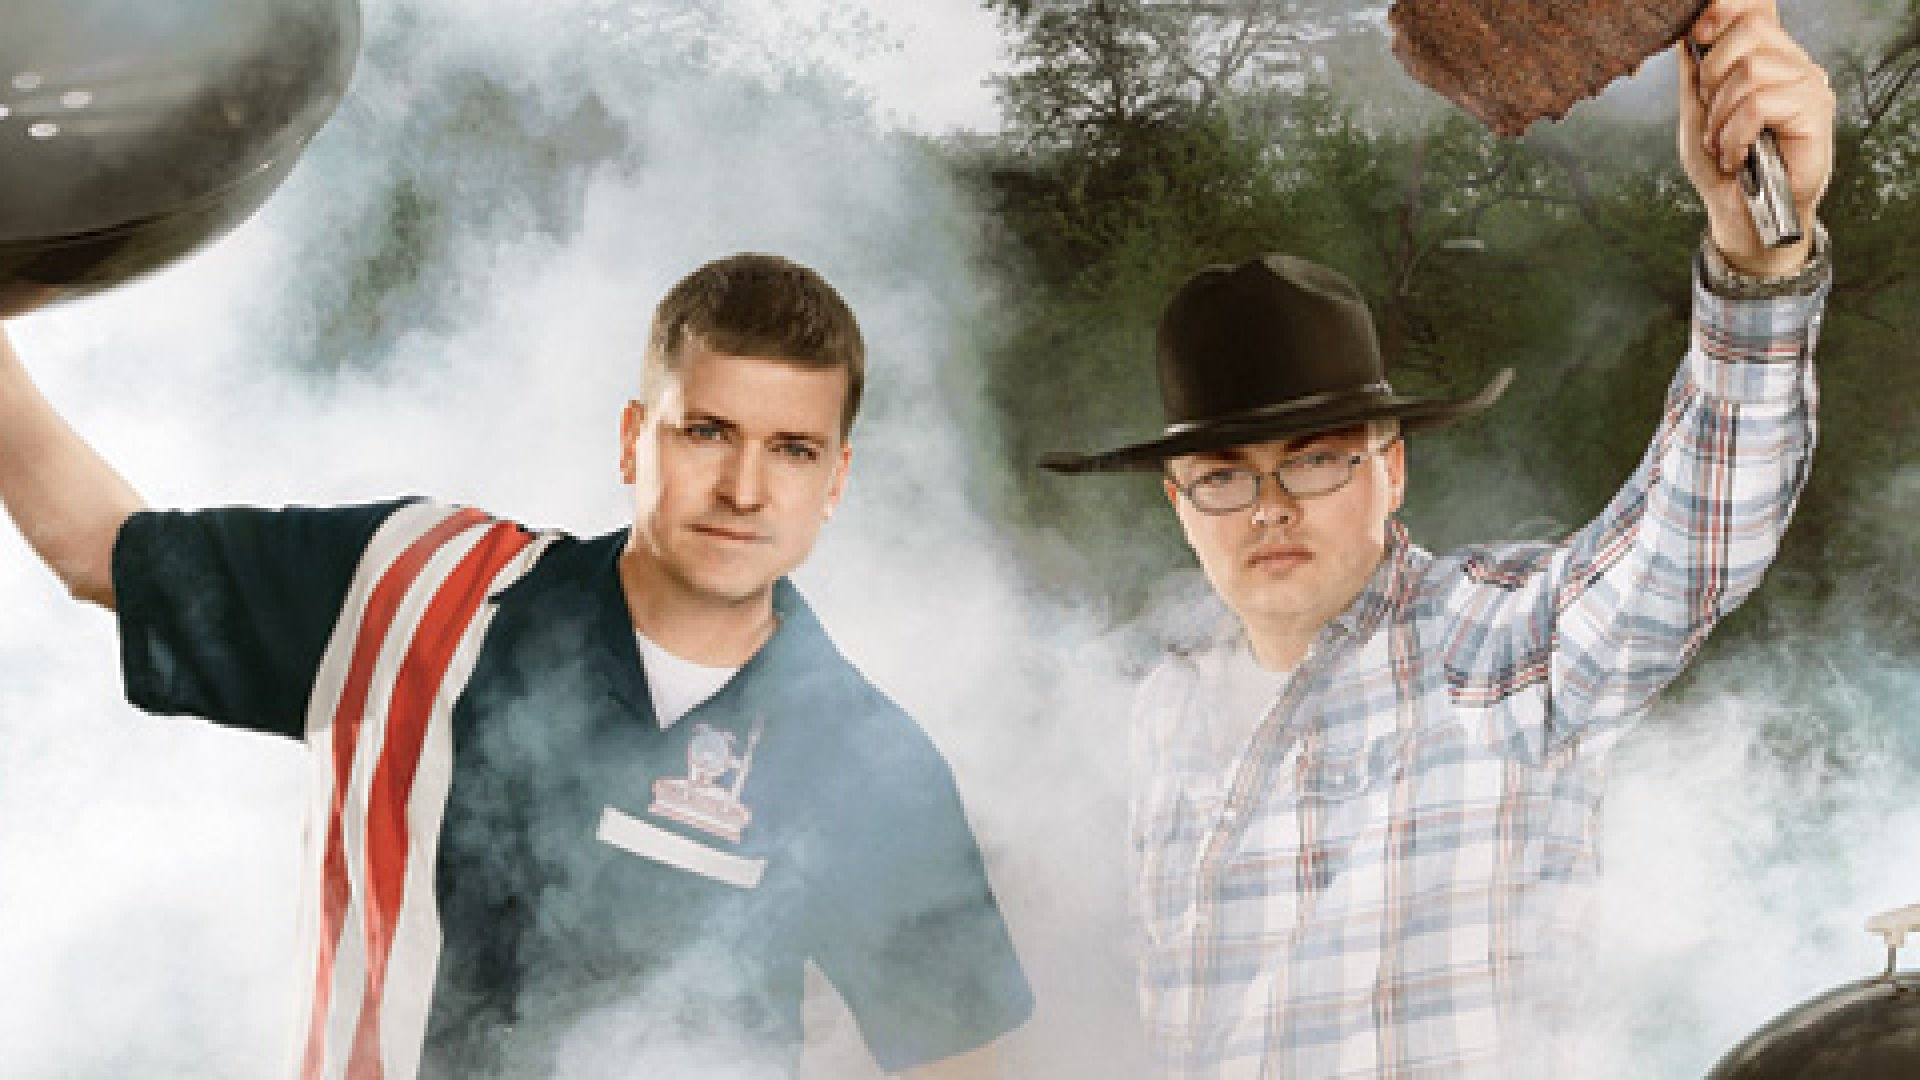 <b>REALITY BITES: </b>Brett Thompson (left) and Heath Hall were barbecue hobbyist-until an appearance on ABC's <em>Shark Tank.</em>